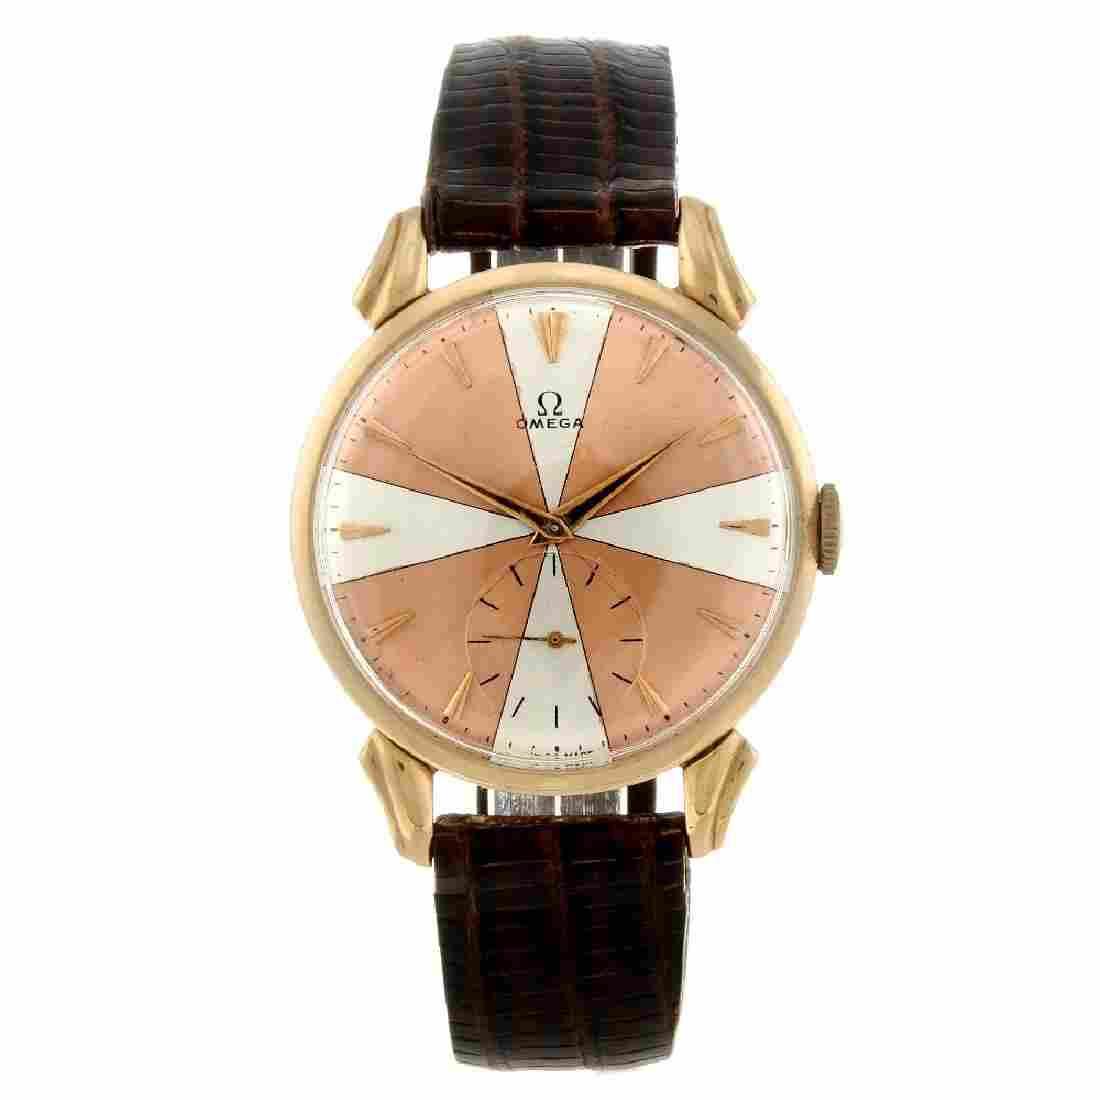 OMEGA - a gentleman's wrist watch. Yellow metal case.